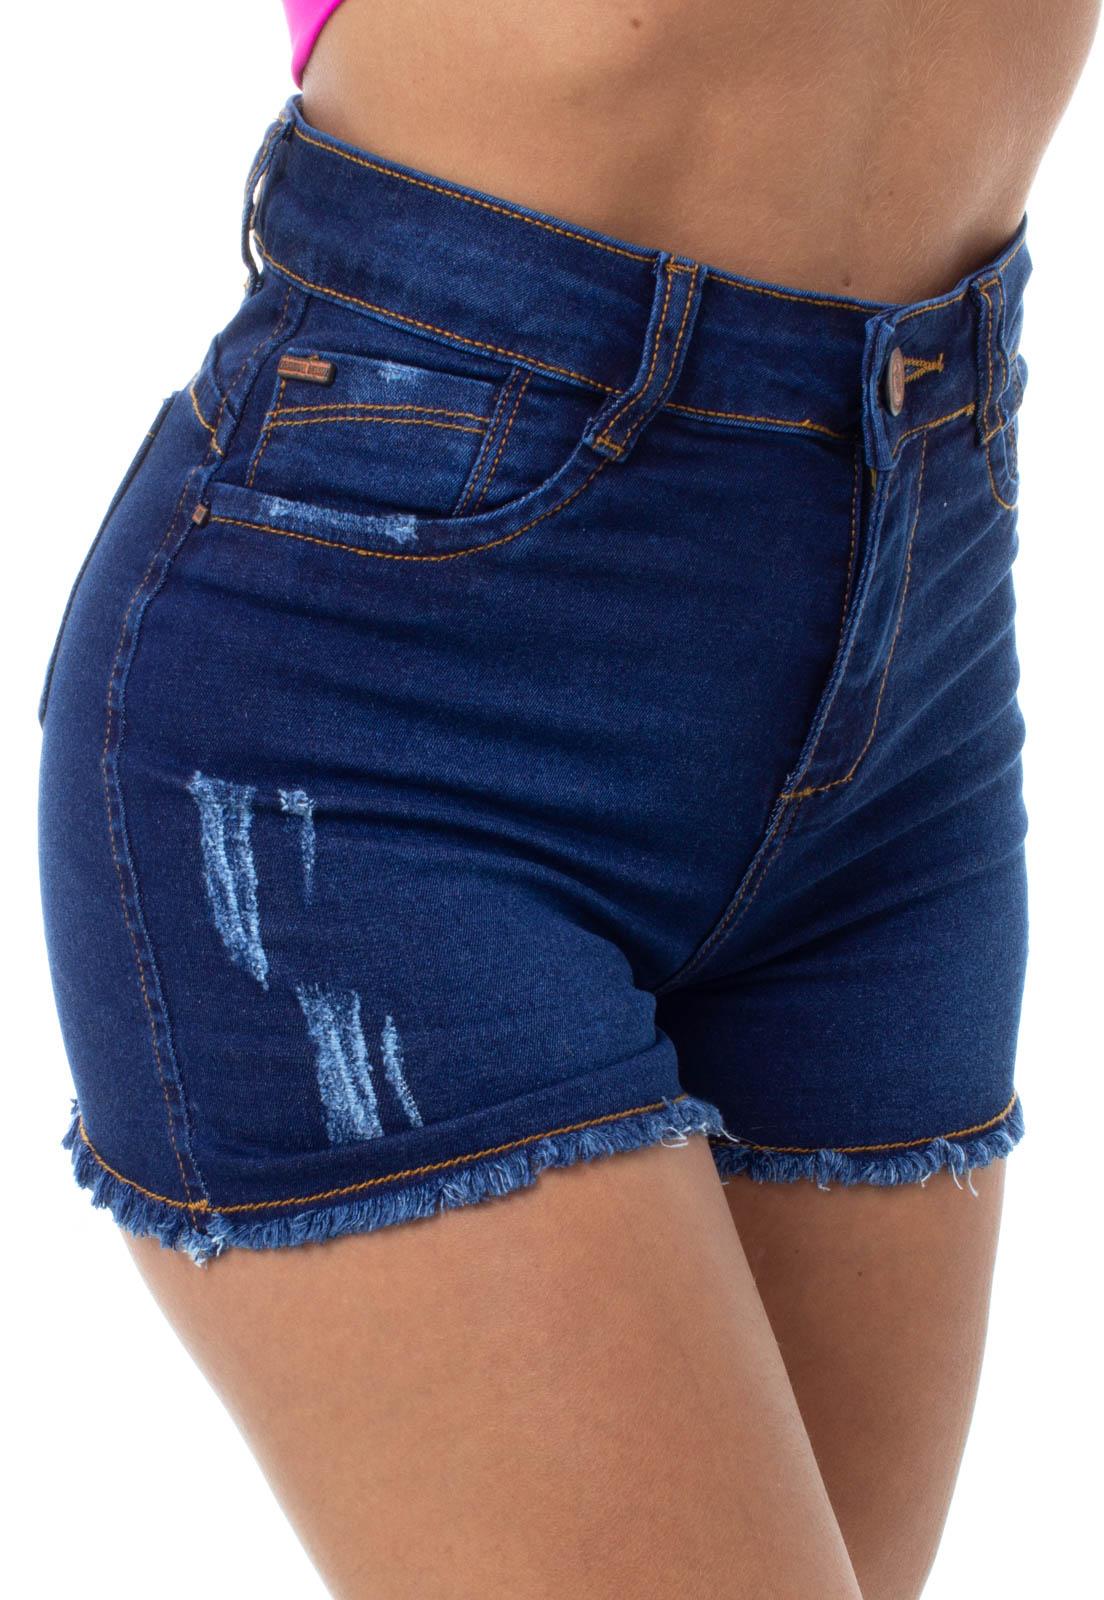 Shorts Jeans Feminino Curto Barra Desfiada Slim Crocker - 47917  - CROCKER JEANS